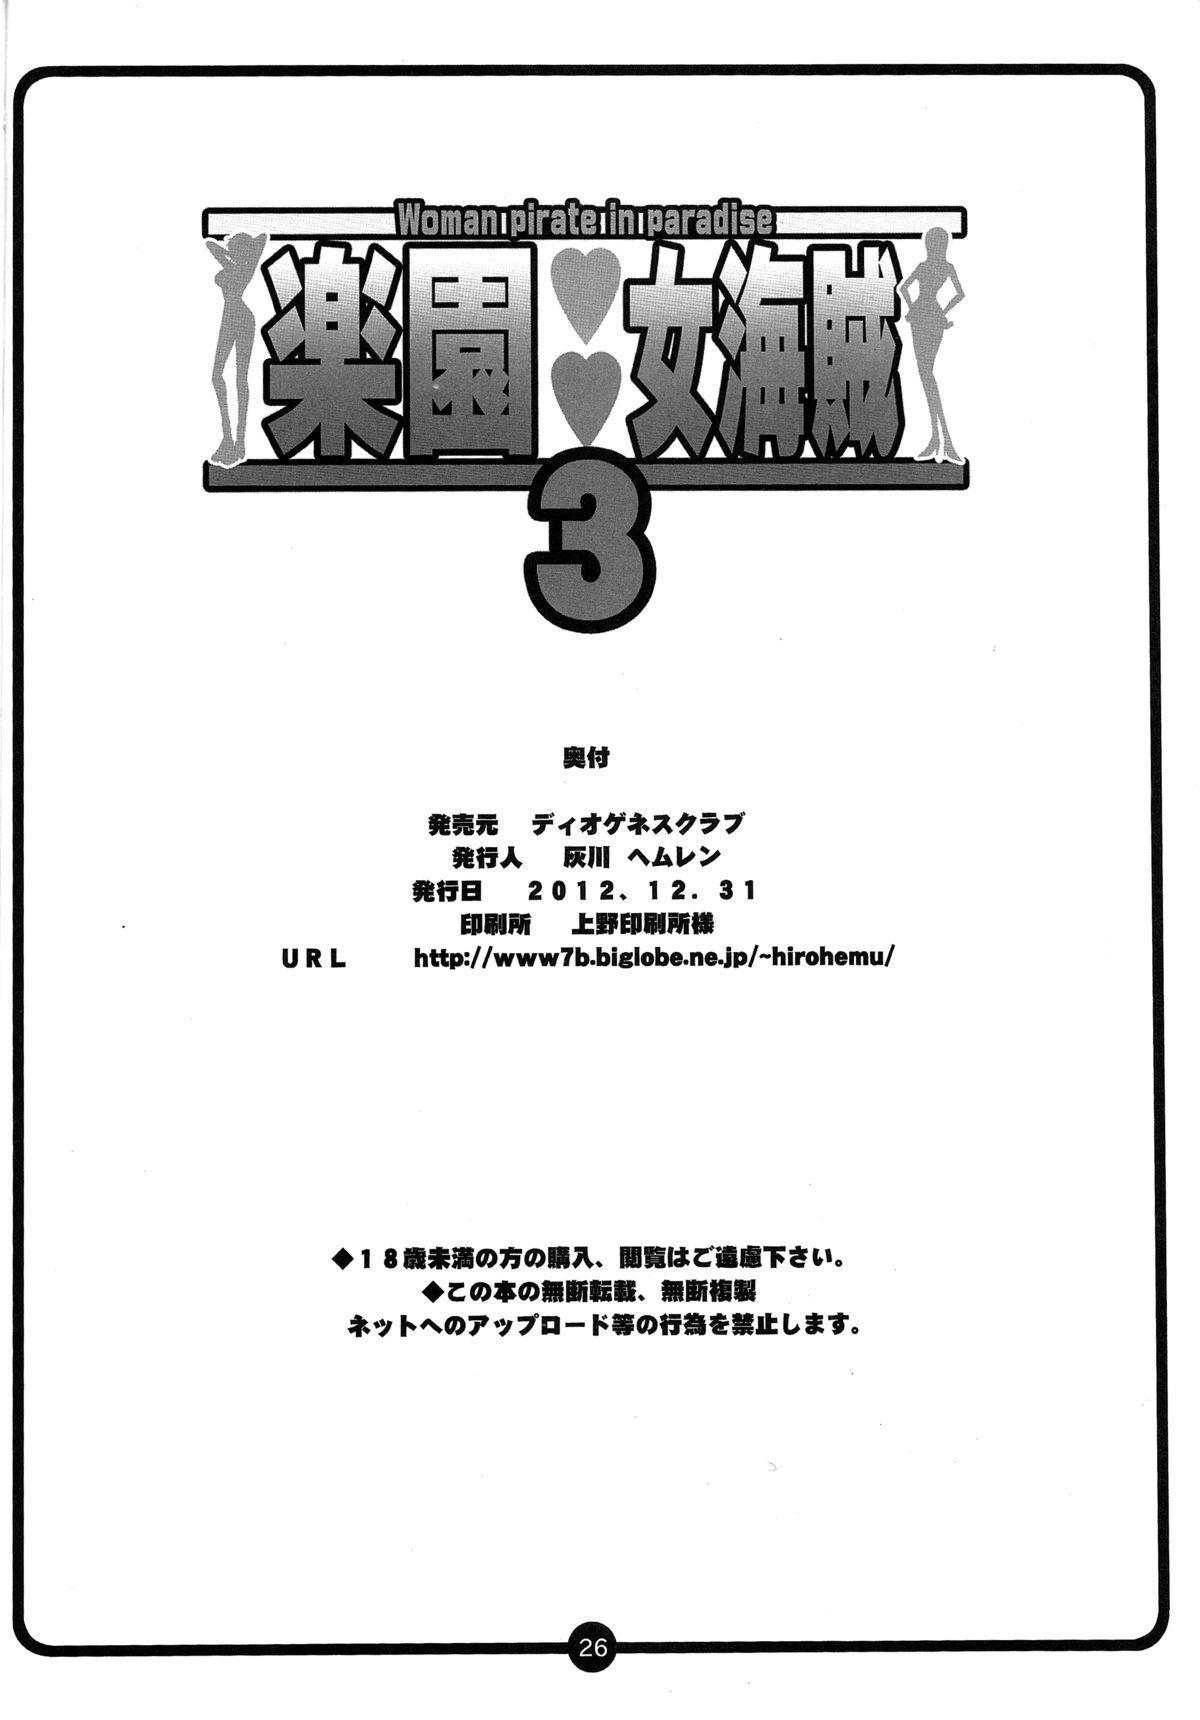 Rakuen Onna Kaizoku 3 - Woman Pirate in Paradise 24